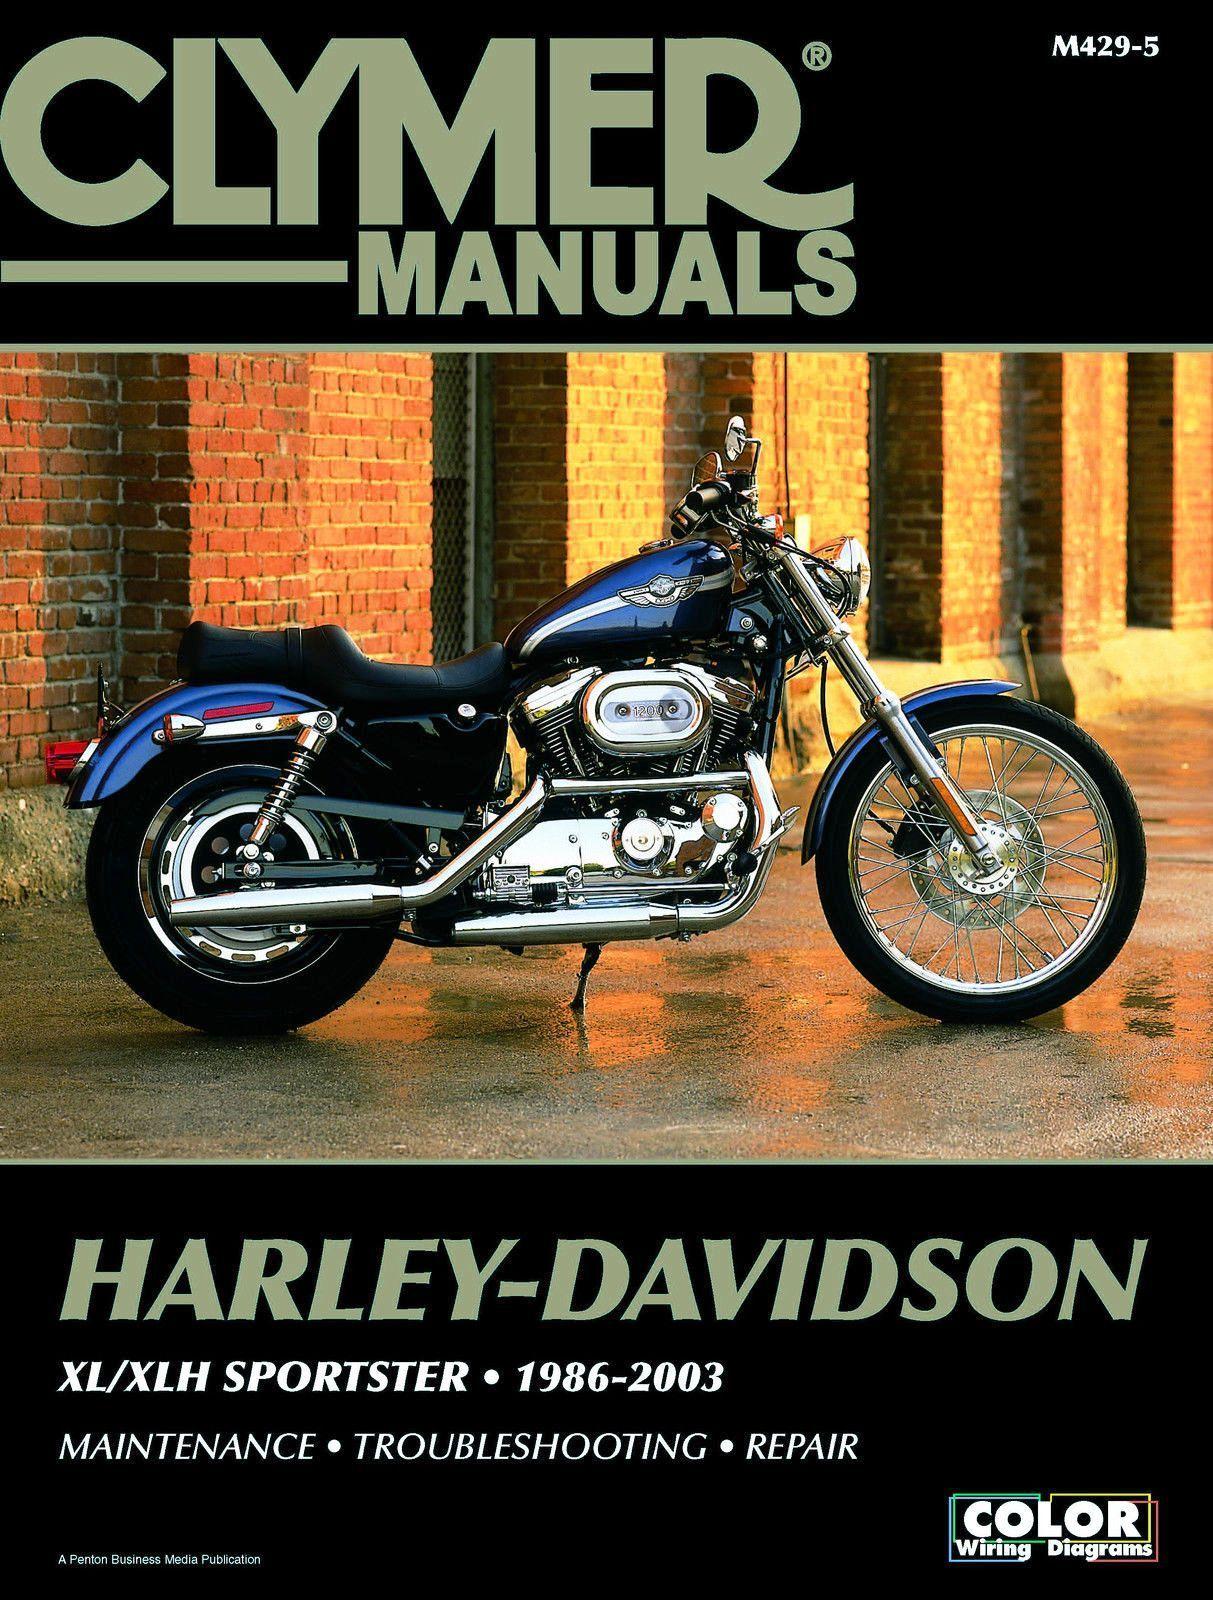 Clymer Repair Manual Harley-Davidson XL/XLH Sportster 1986-2003 M429-5